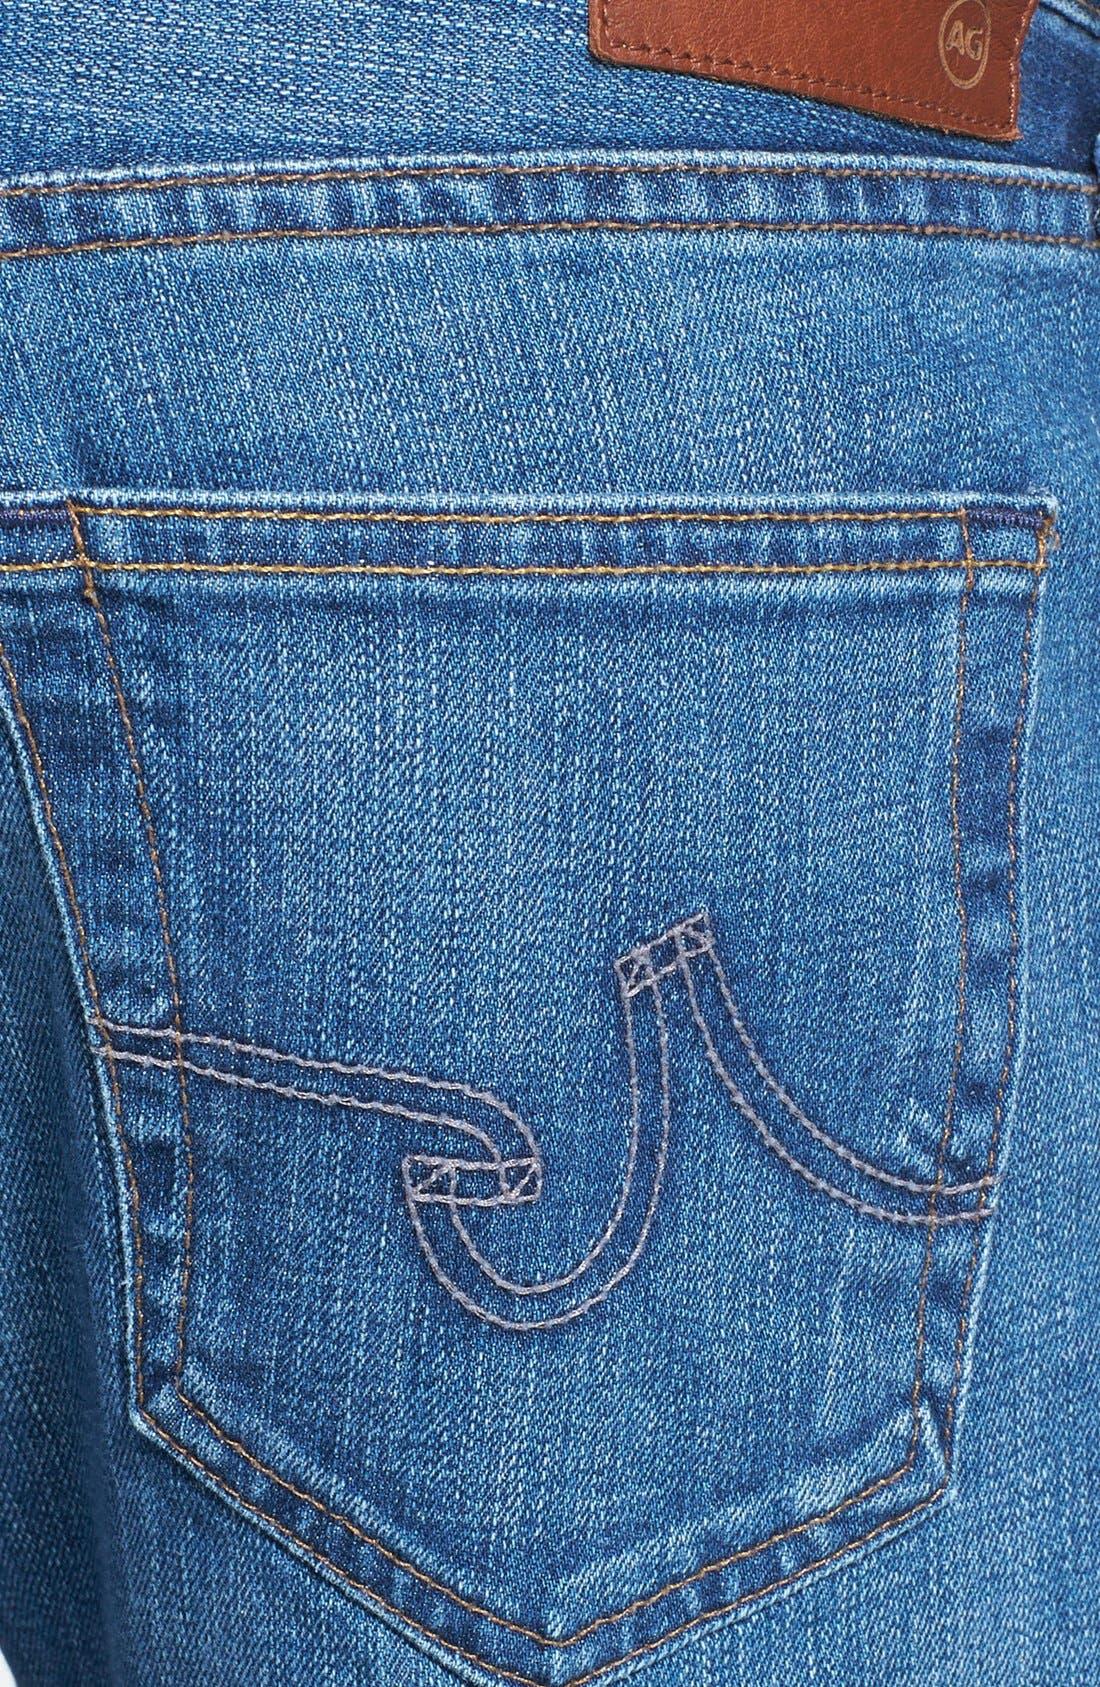 Alternate Image 4  - AG Jeans 'Protégé' Straight Leg Jeans (Eleven Year Wildcraft)